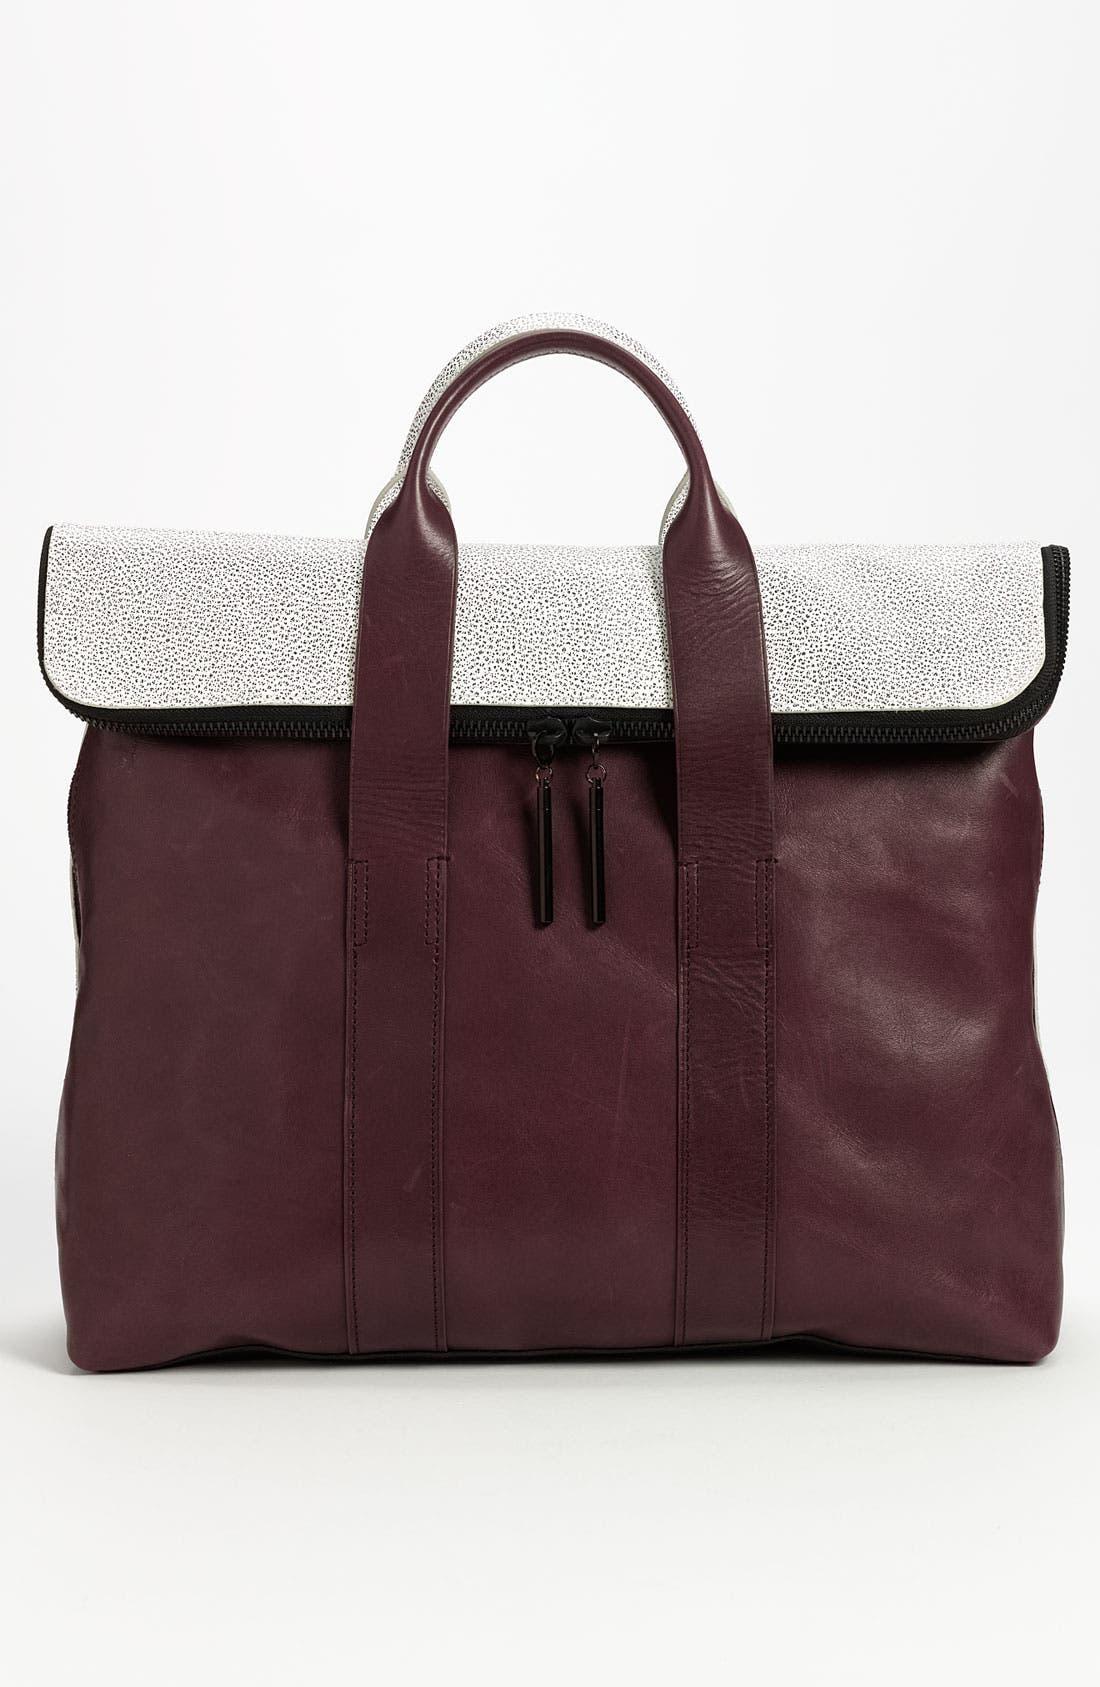 Main Image - 3.1 Phillip Lim '31 Hour' Leather Bag